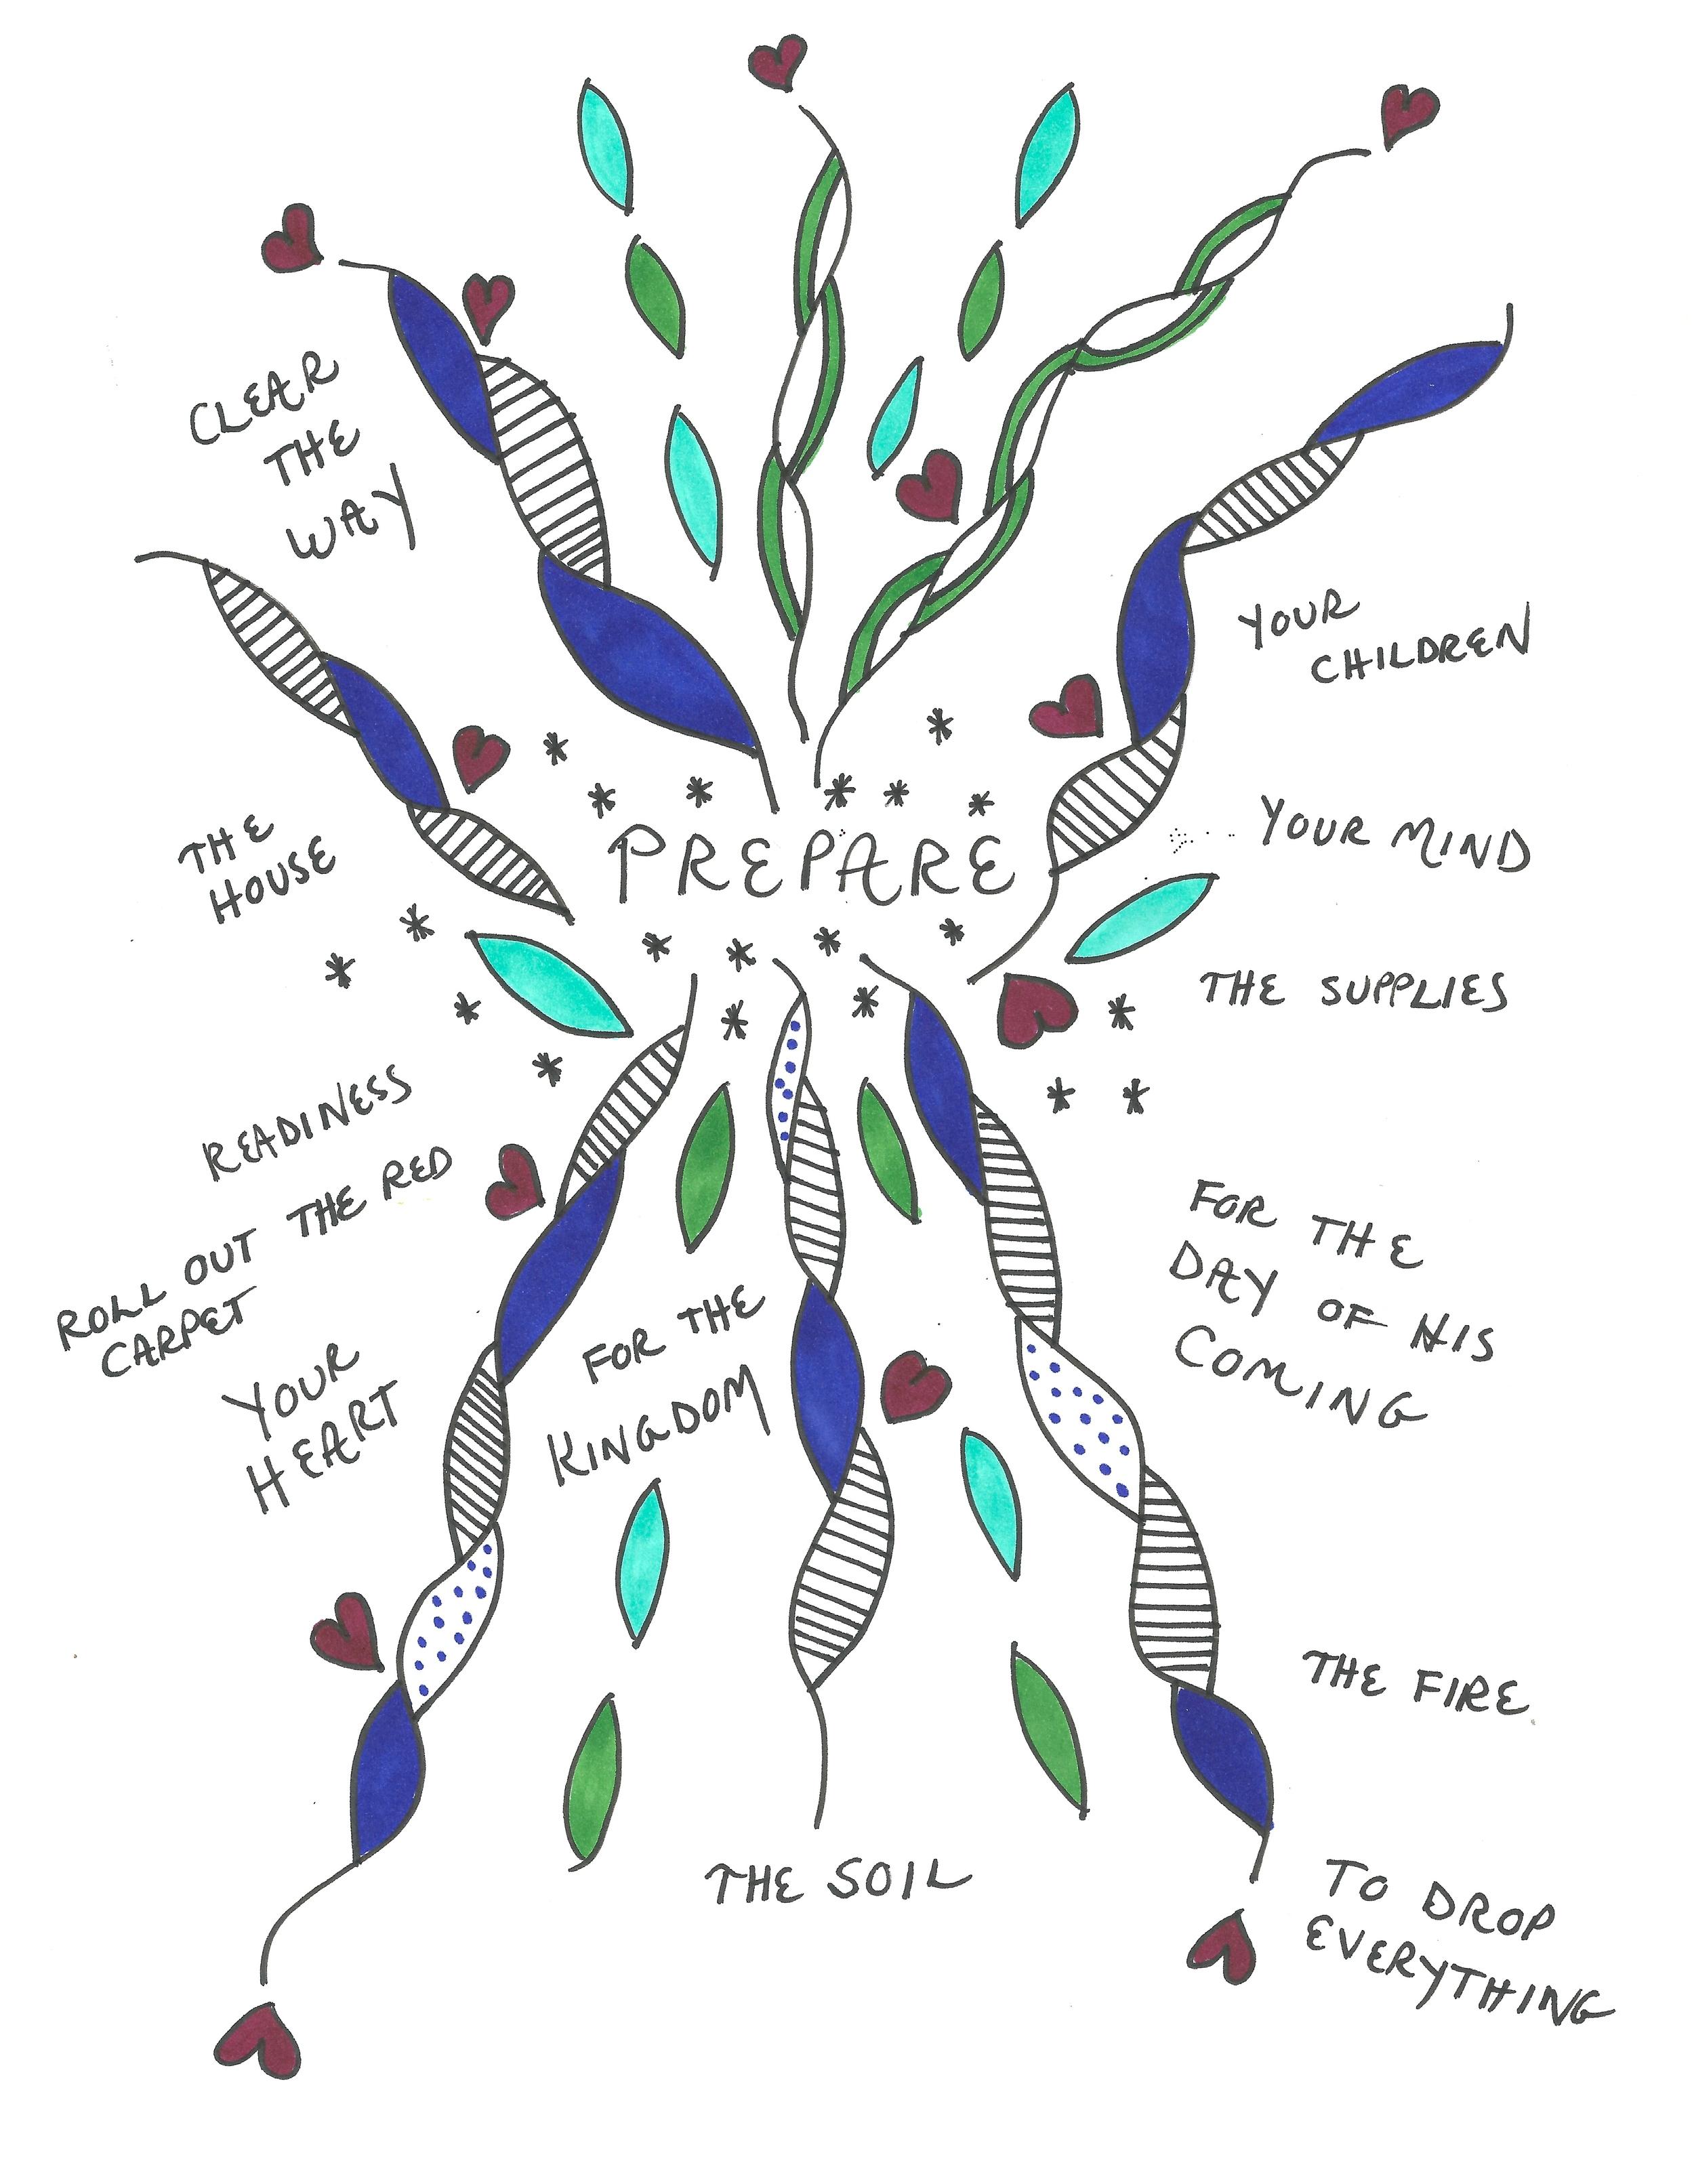 26 ideas for advent with sybil macbeth